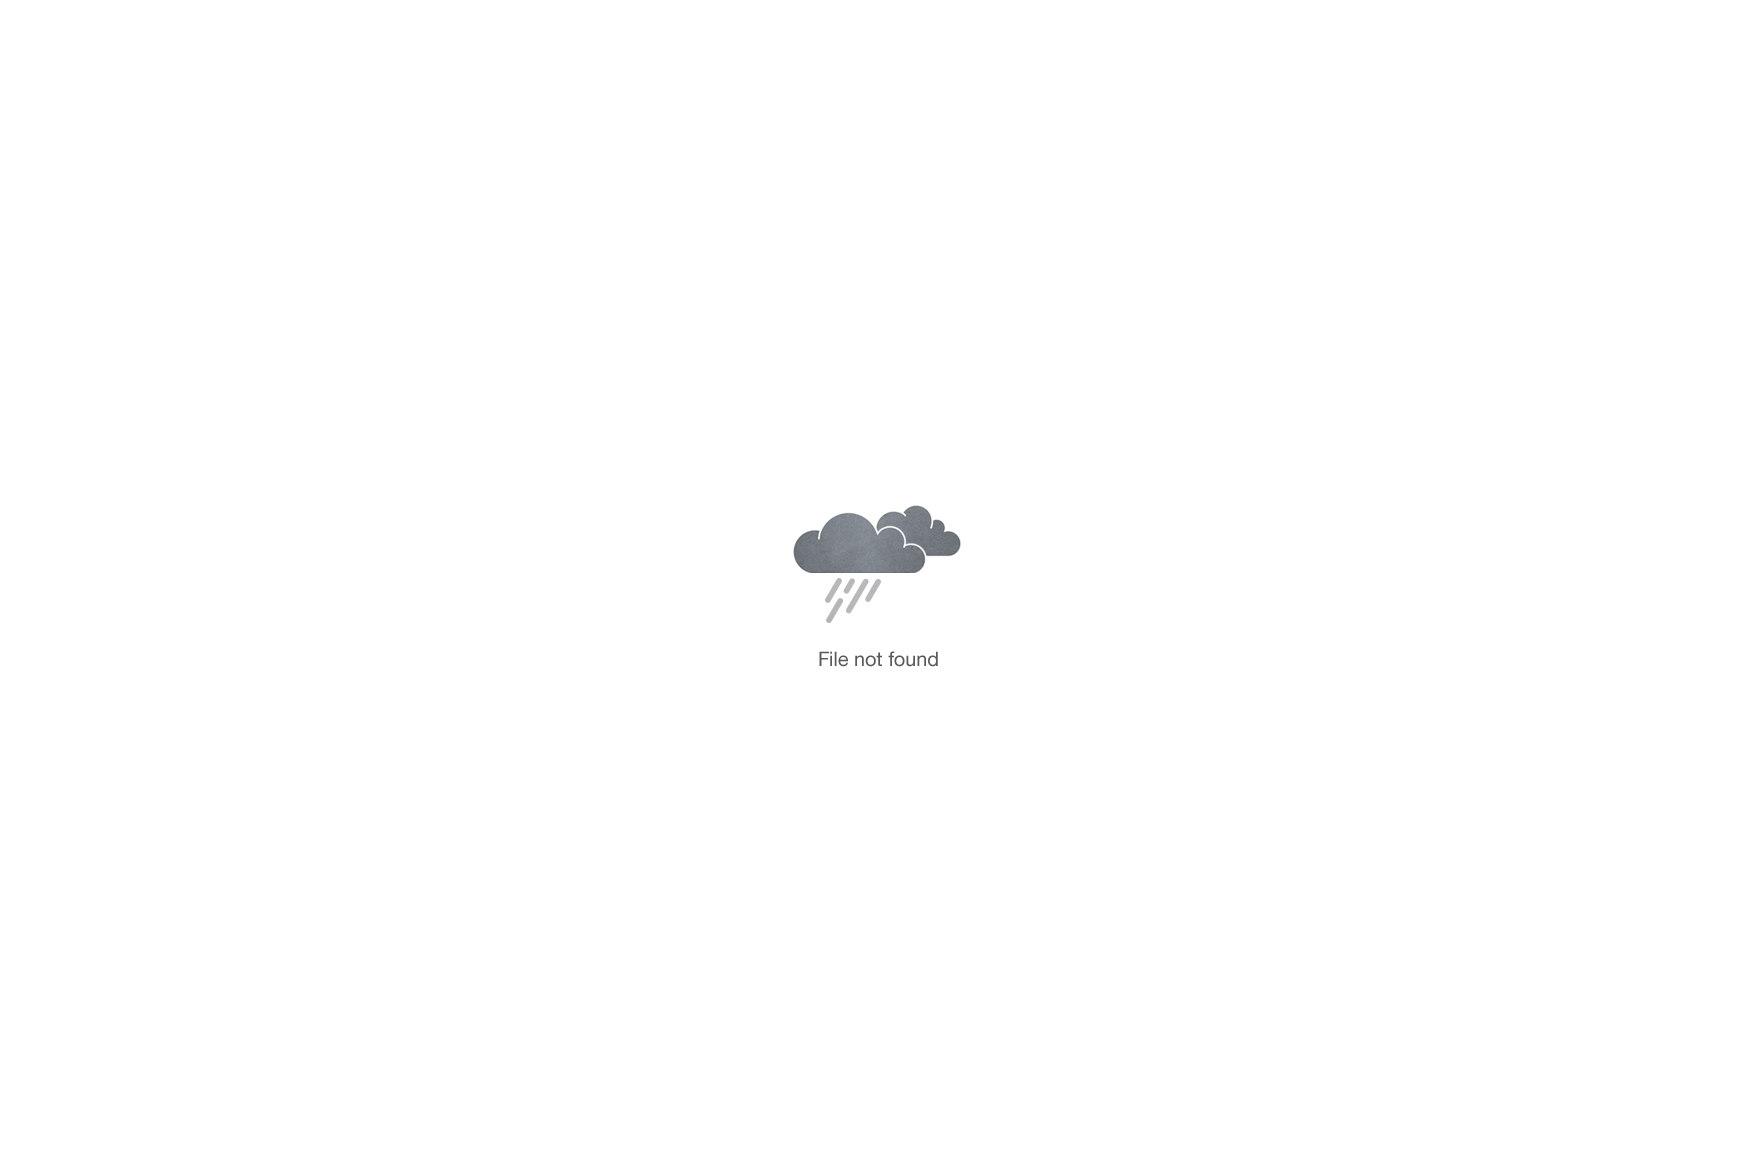 stephane-parisse-Rugby-Sponsorise-me-image-4